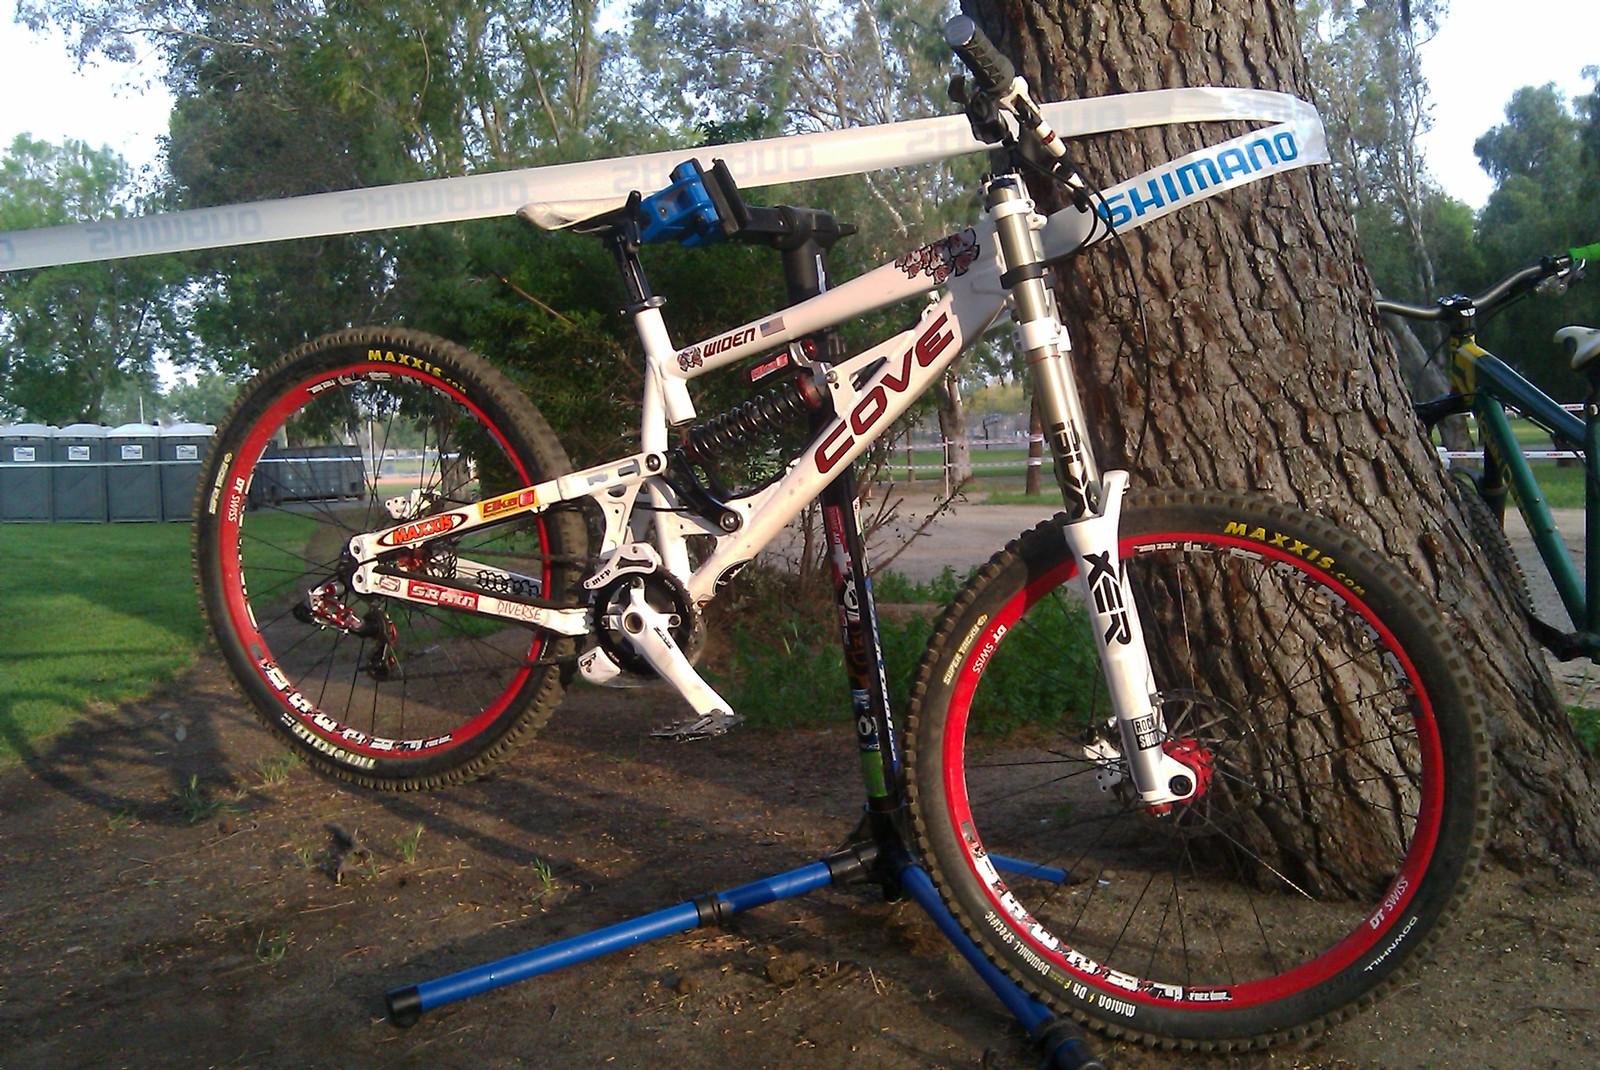 IMAG0020 - WidenJ5 - Mountain Biking Pictures - Vital MTB